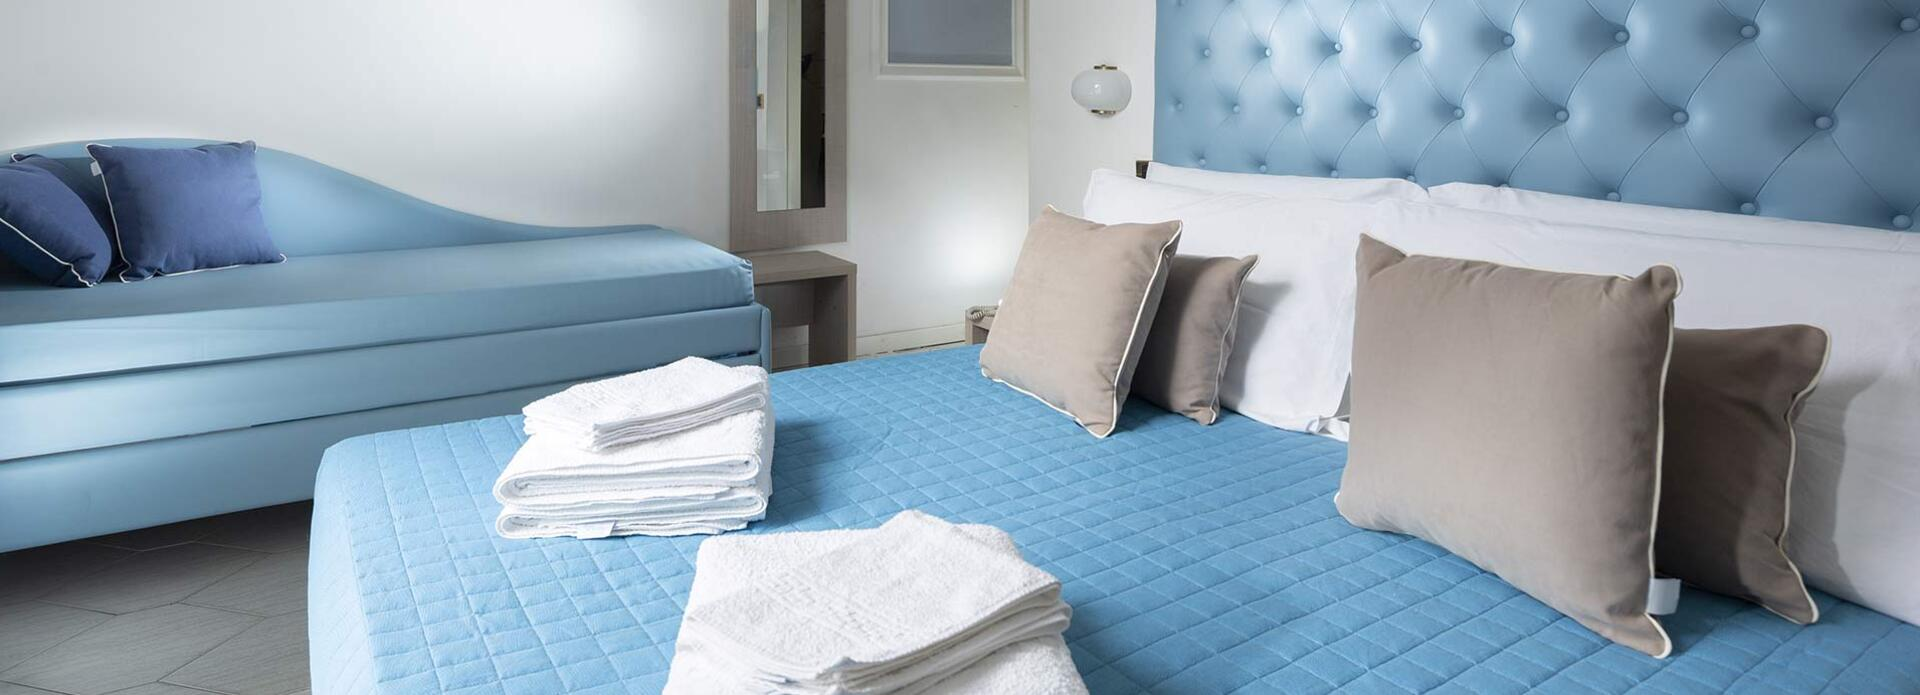 hotelitaliarimini en rooms 006